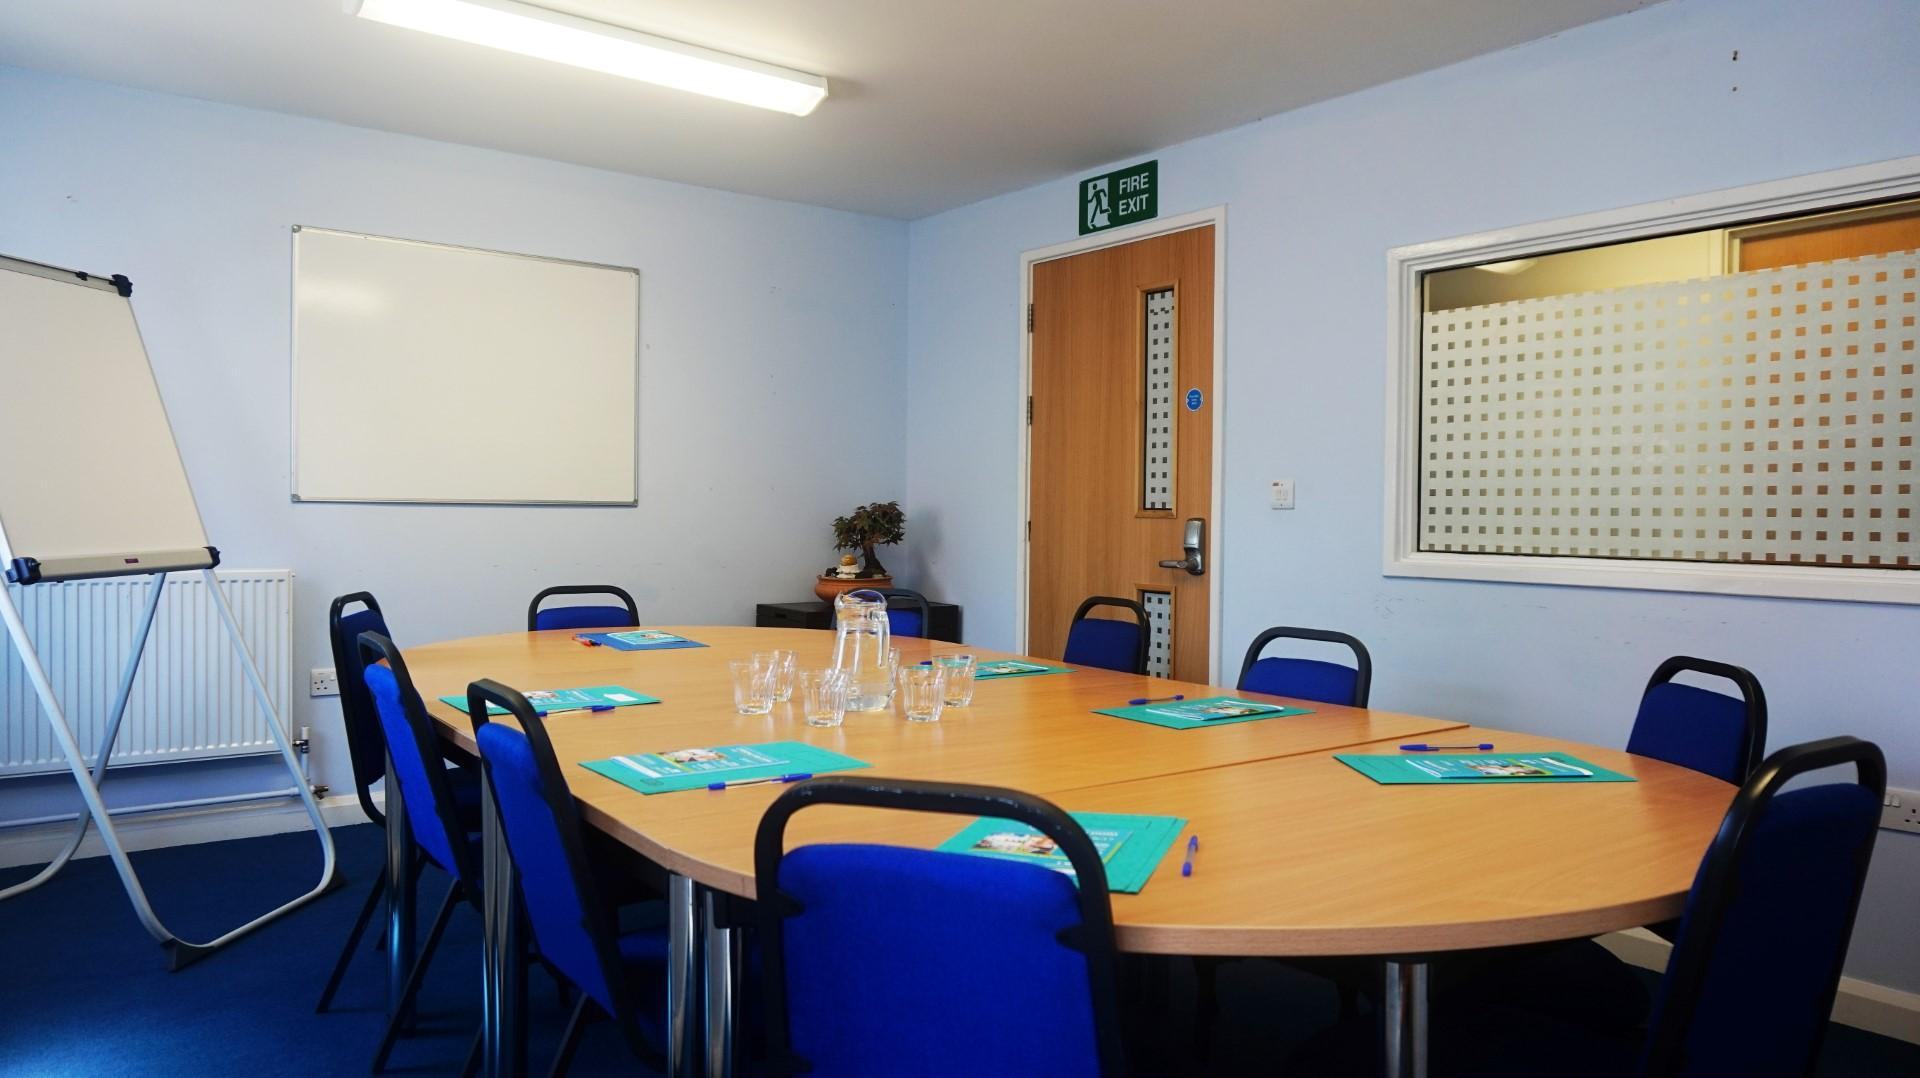 Castleland Community Centre Bookings